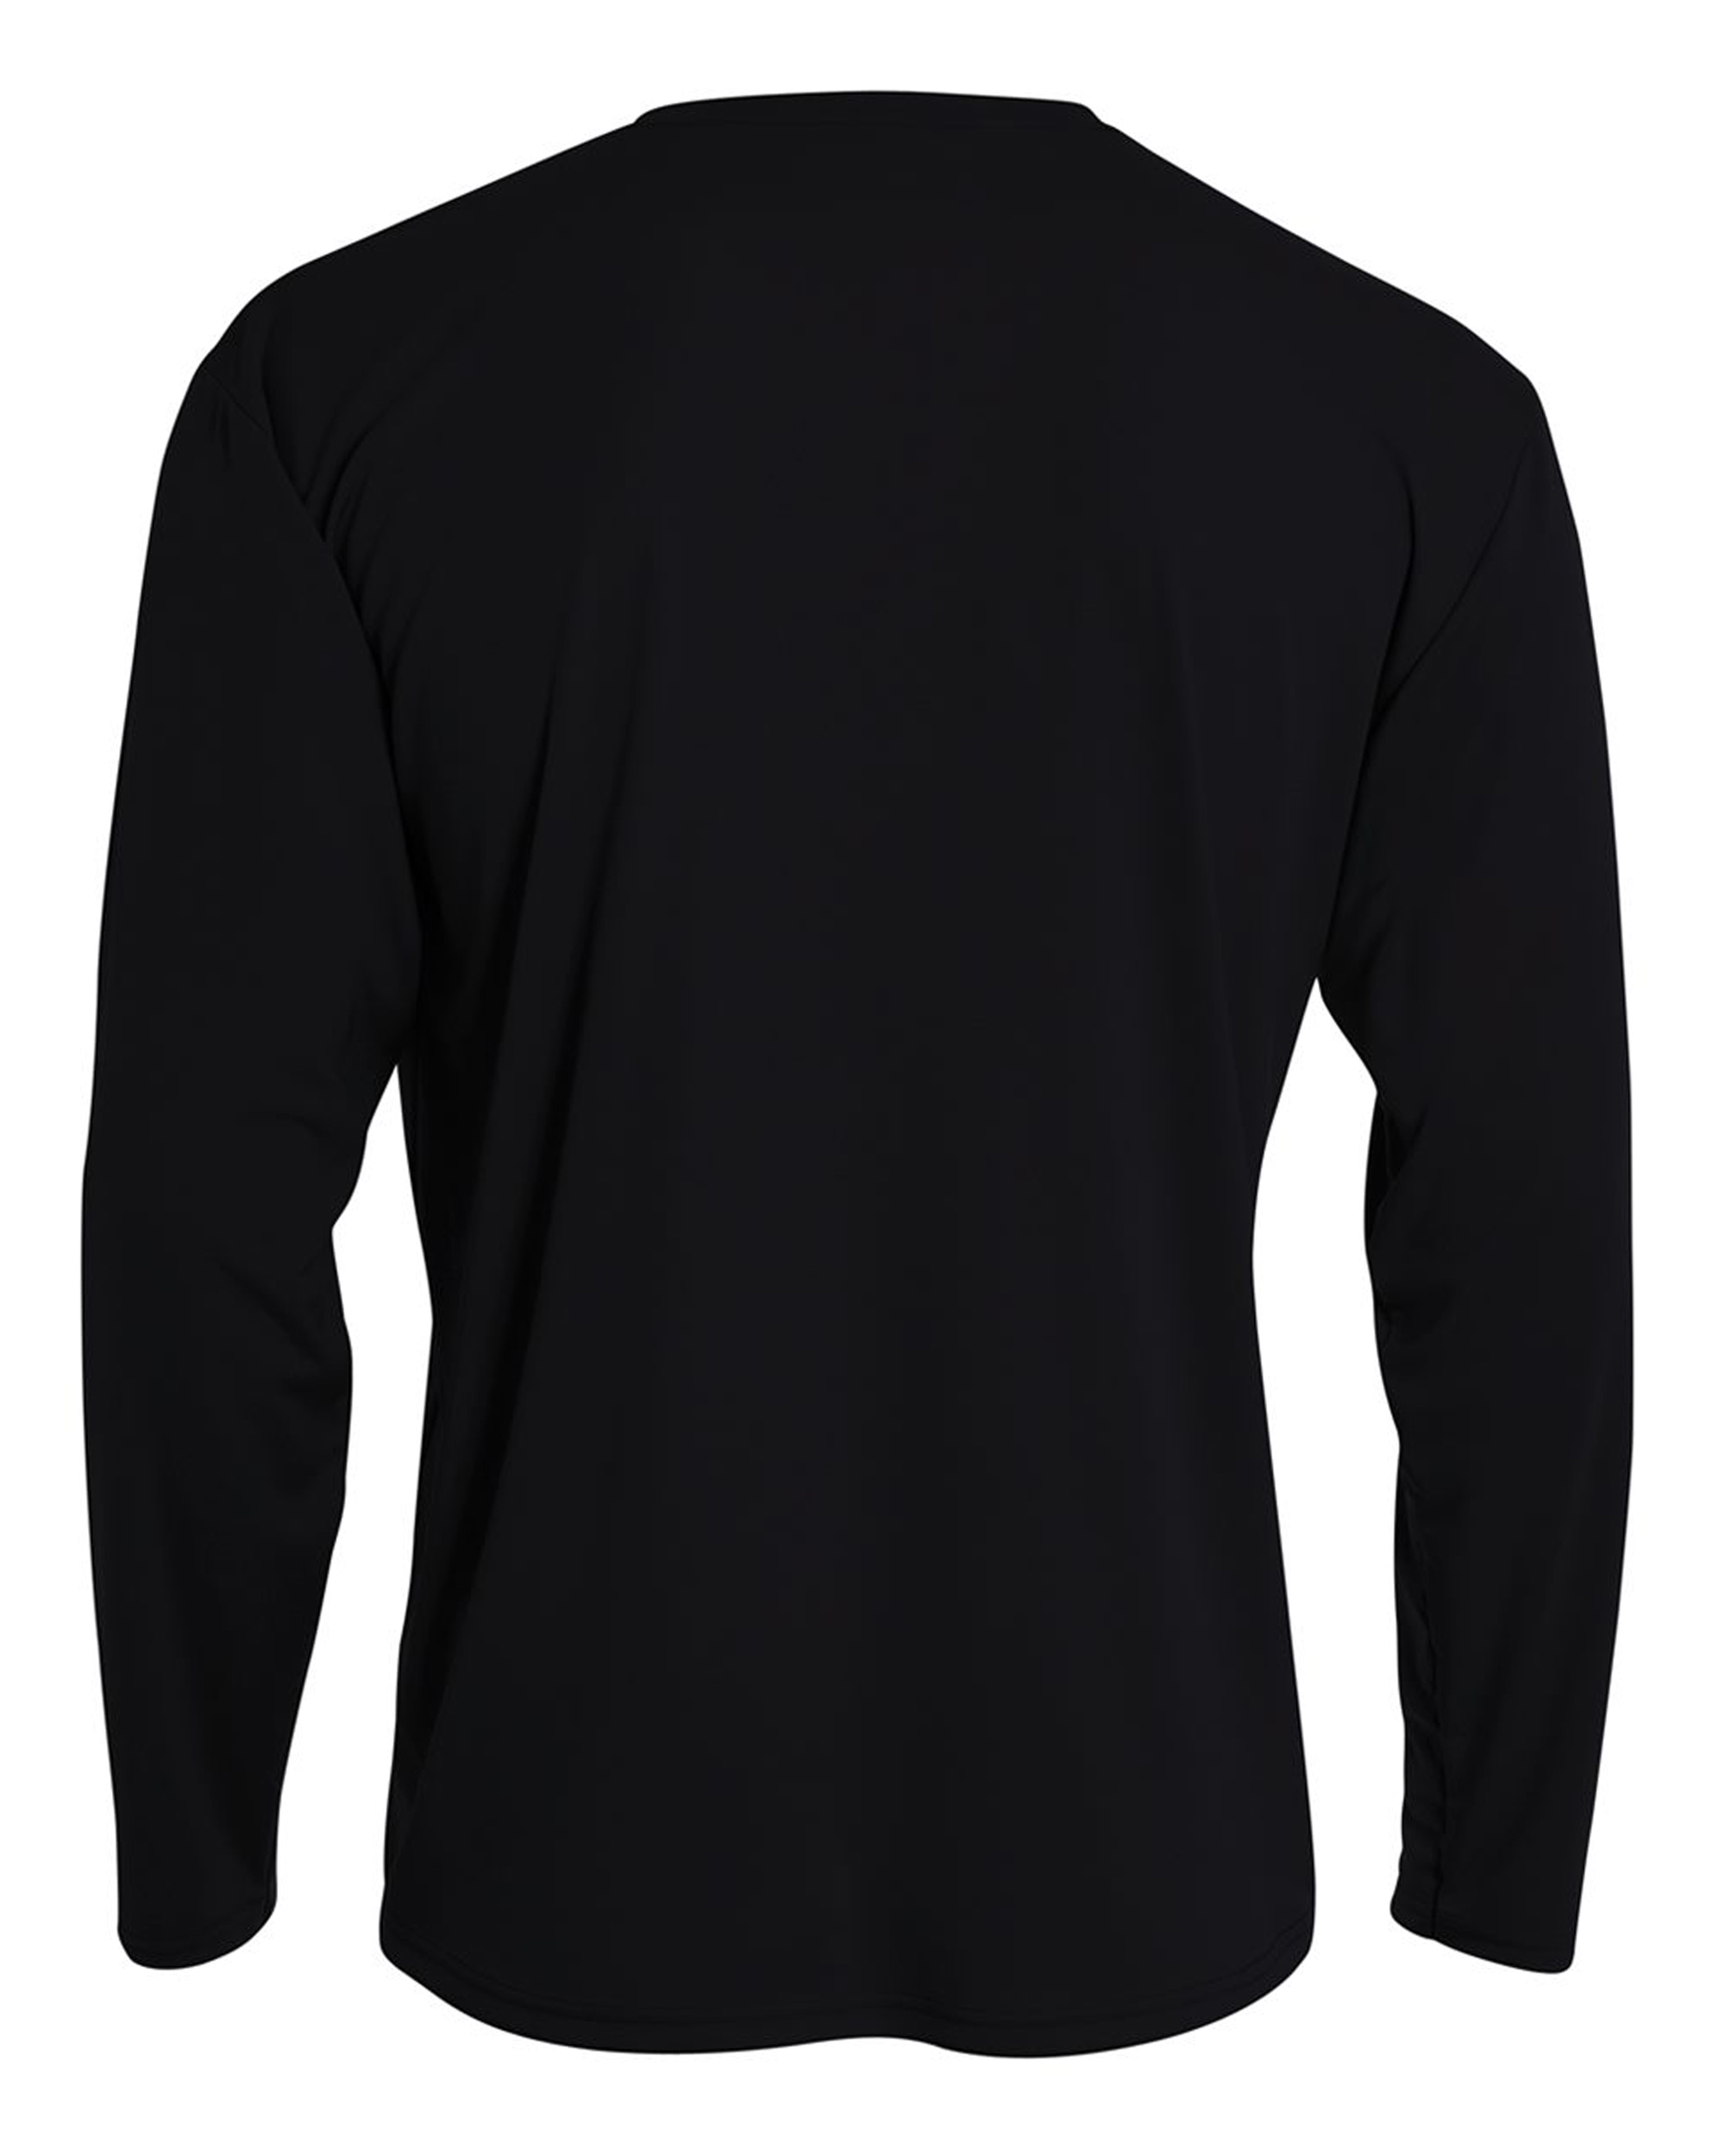 Men-039-s-Long-Sleeve-Loose-Fit-Rash-Guard-Surf-Shirt-Water-Sports-Swimwear thumbnail 4